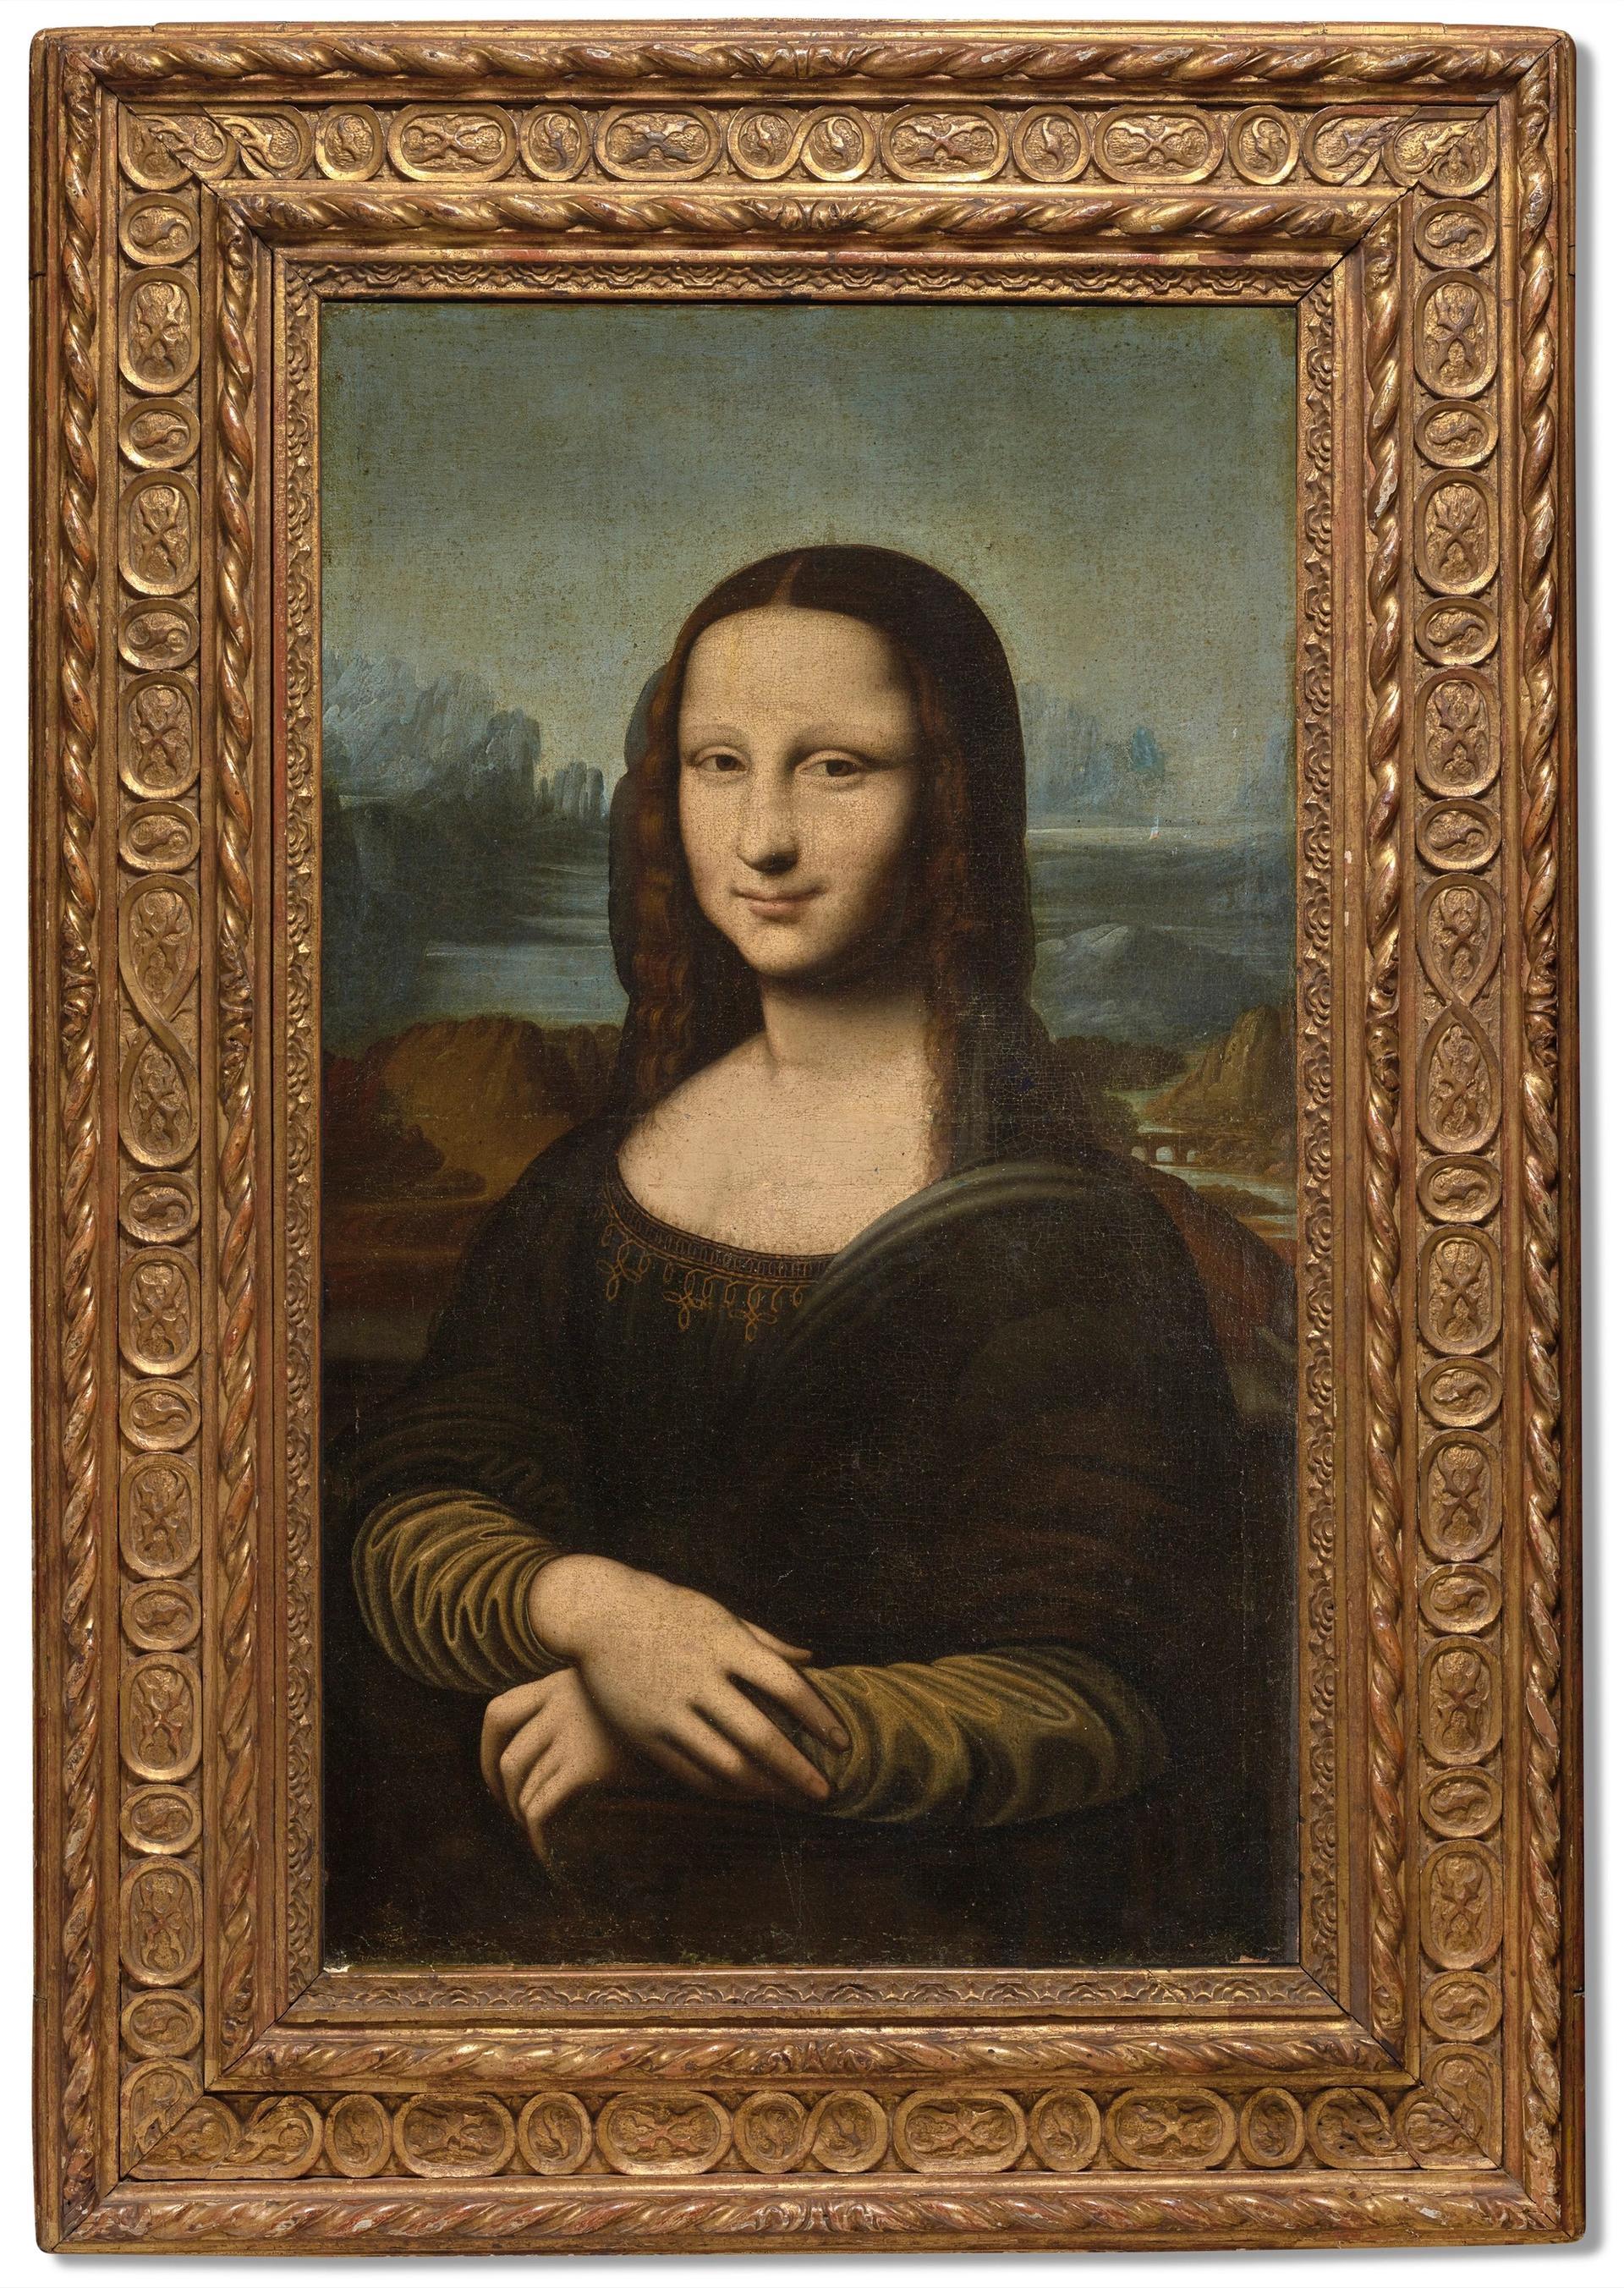 Hekking Mona Lisa courtesy Christie's